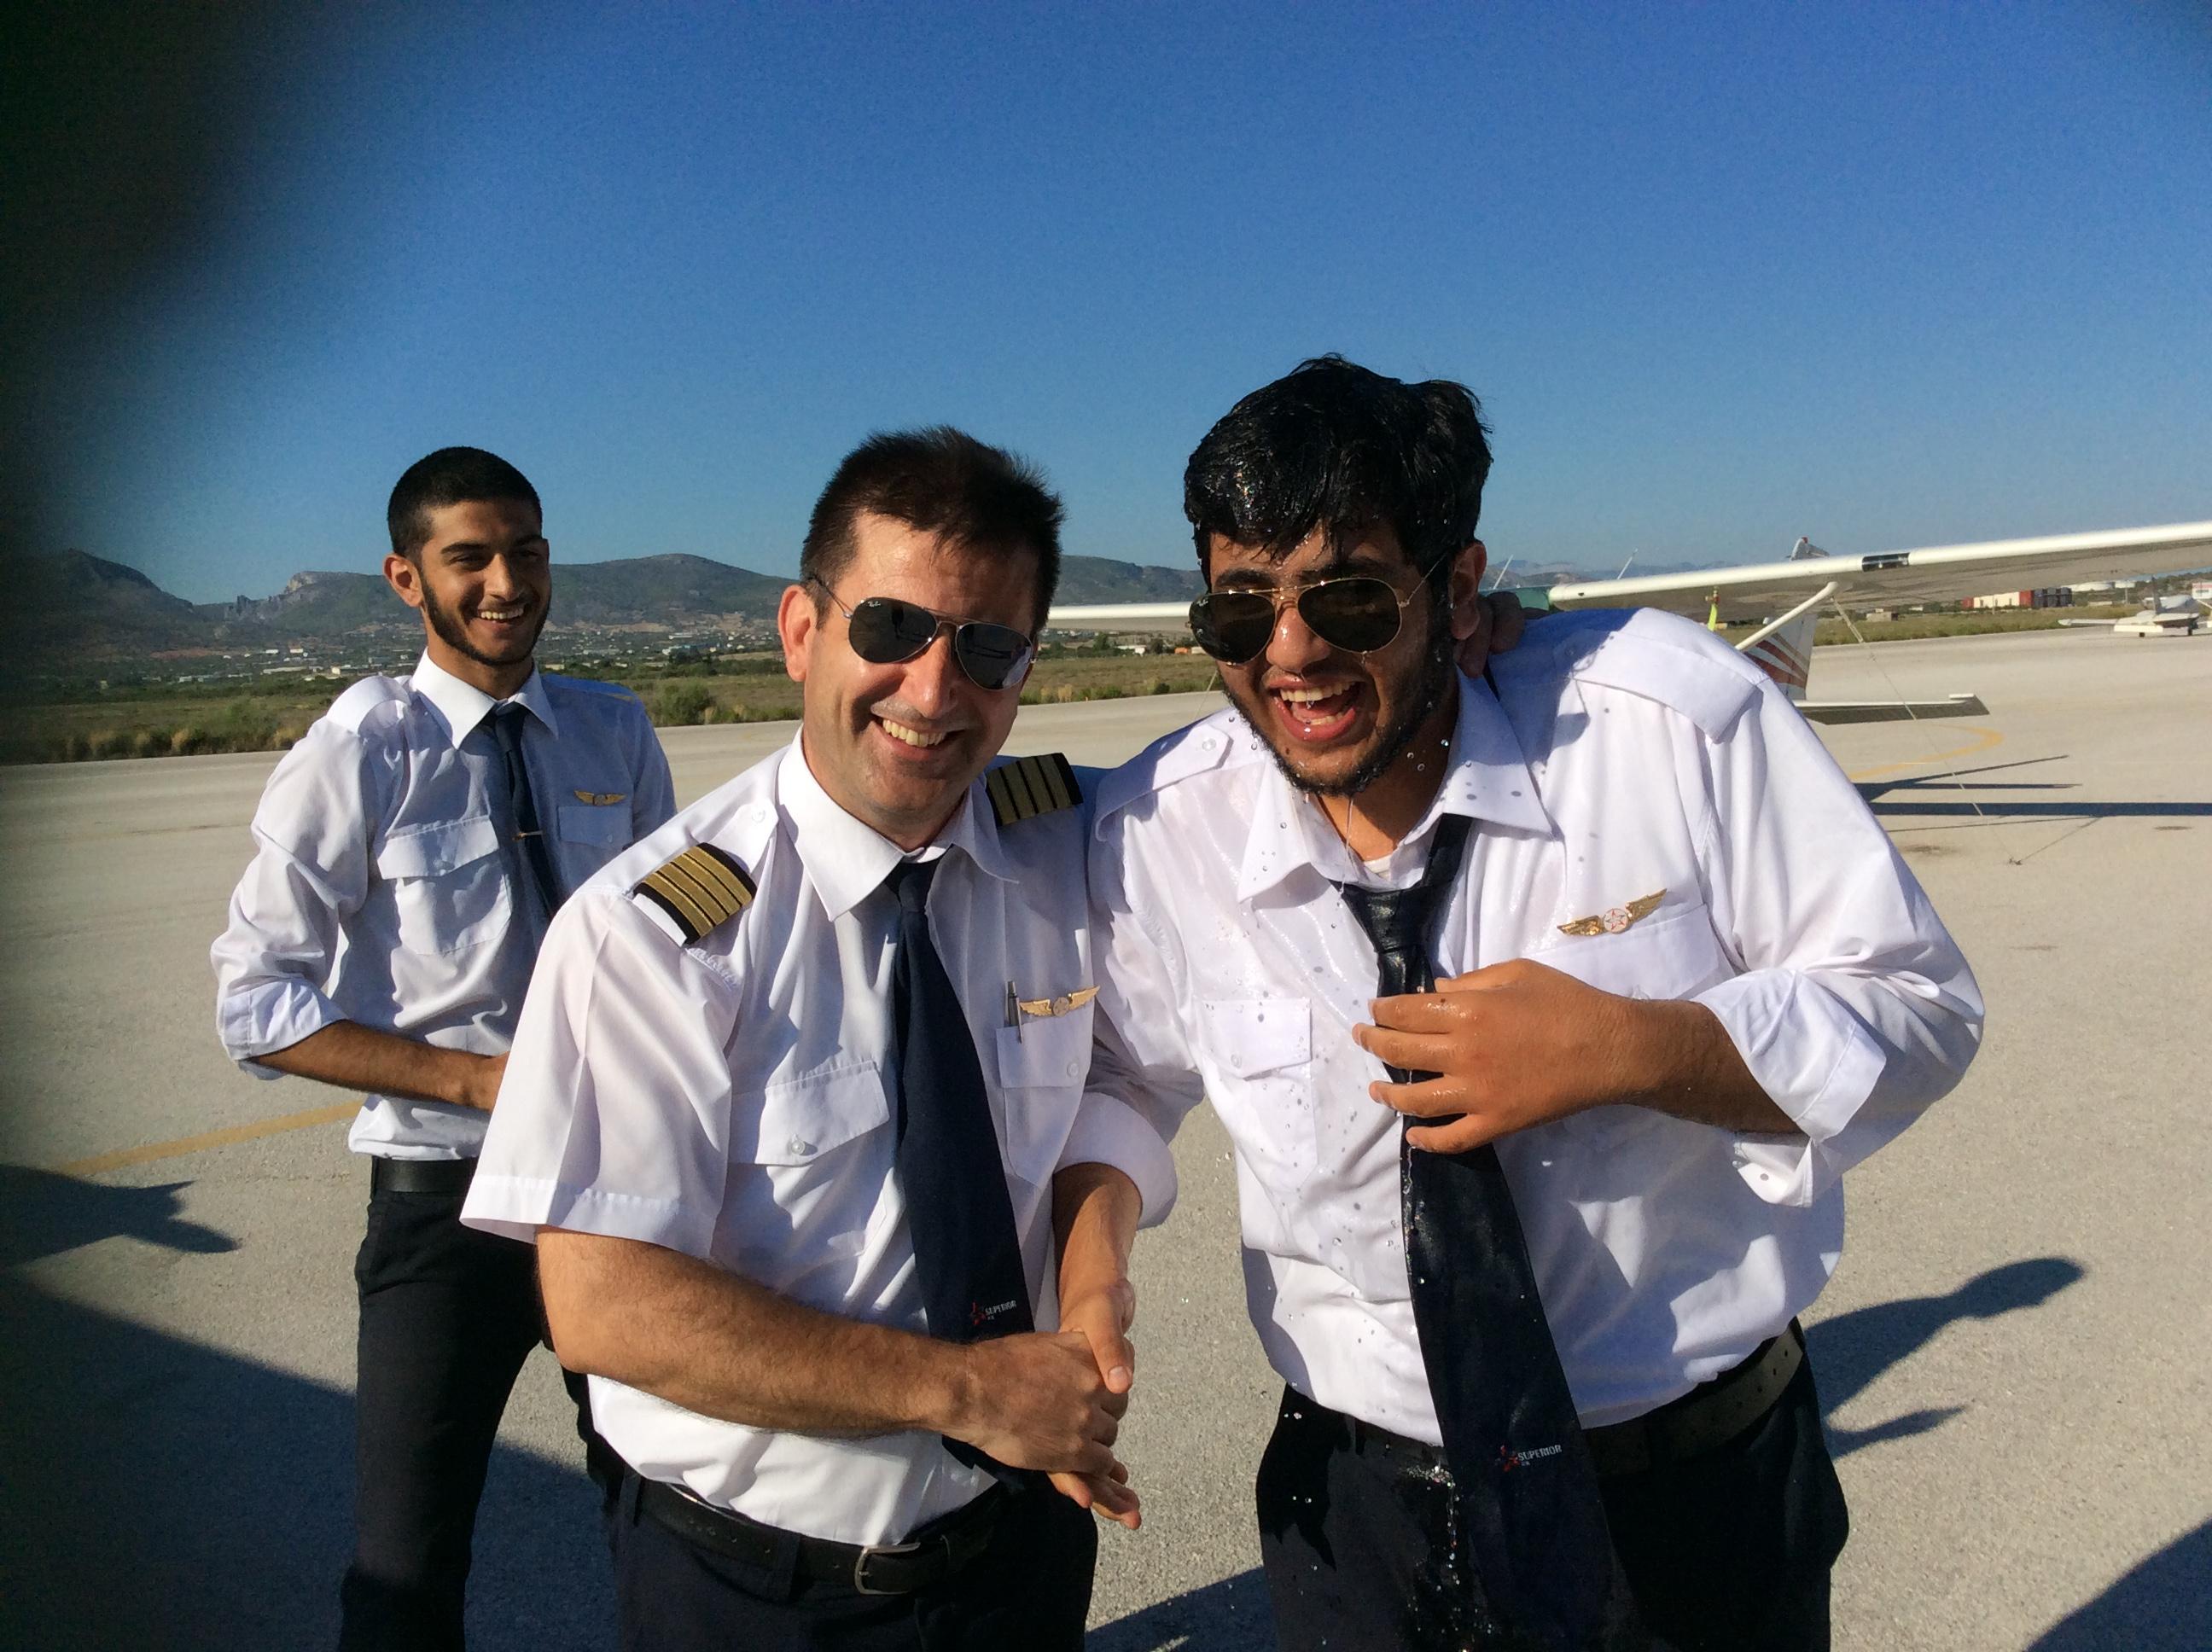 Mr. Abdula Ismael first solo flight!